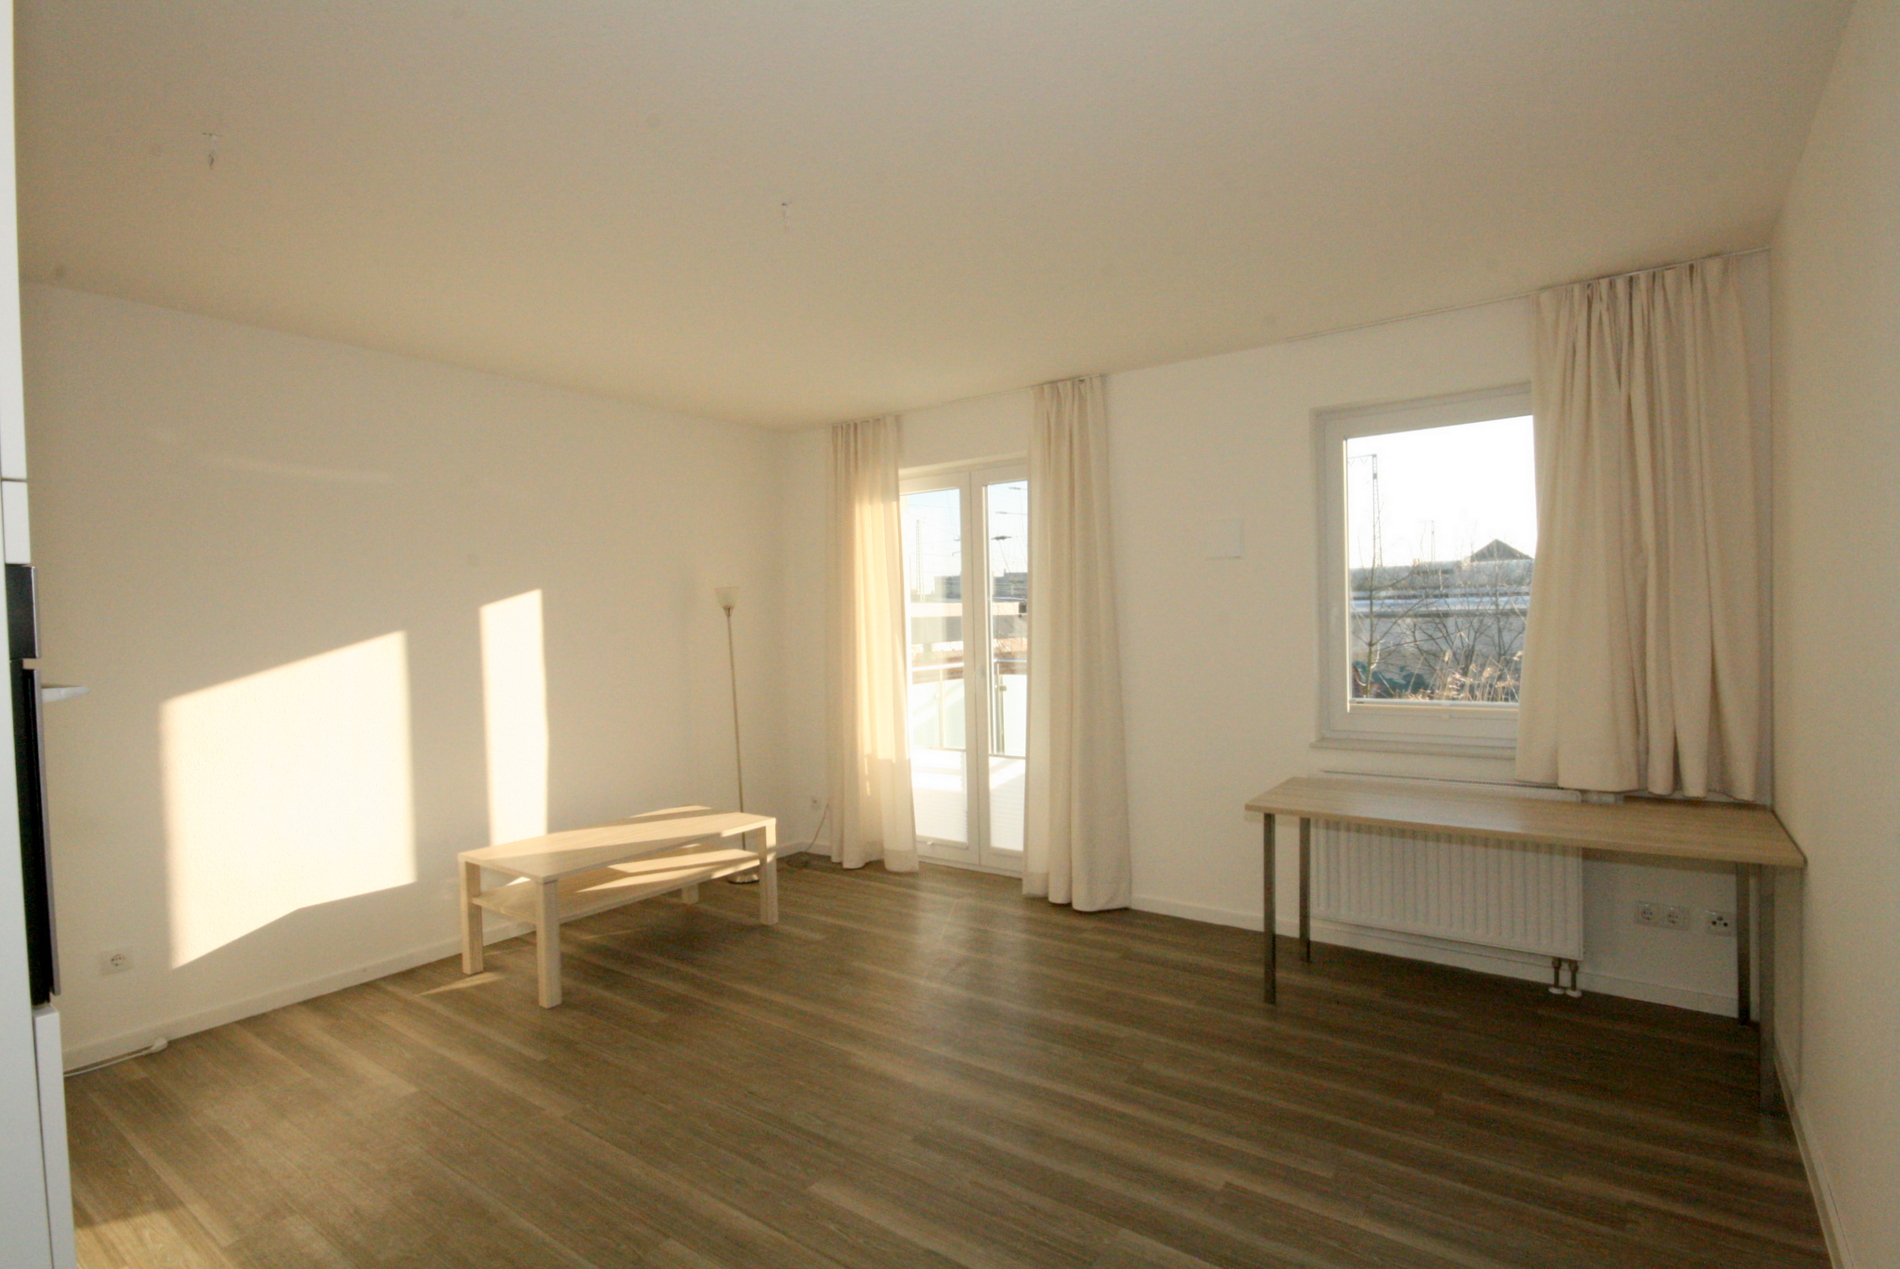 immobiliennews aus osnabr ck rolefs immobilien. Black Bedroom Furniture Sets. Home Design Ideas